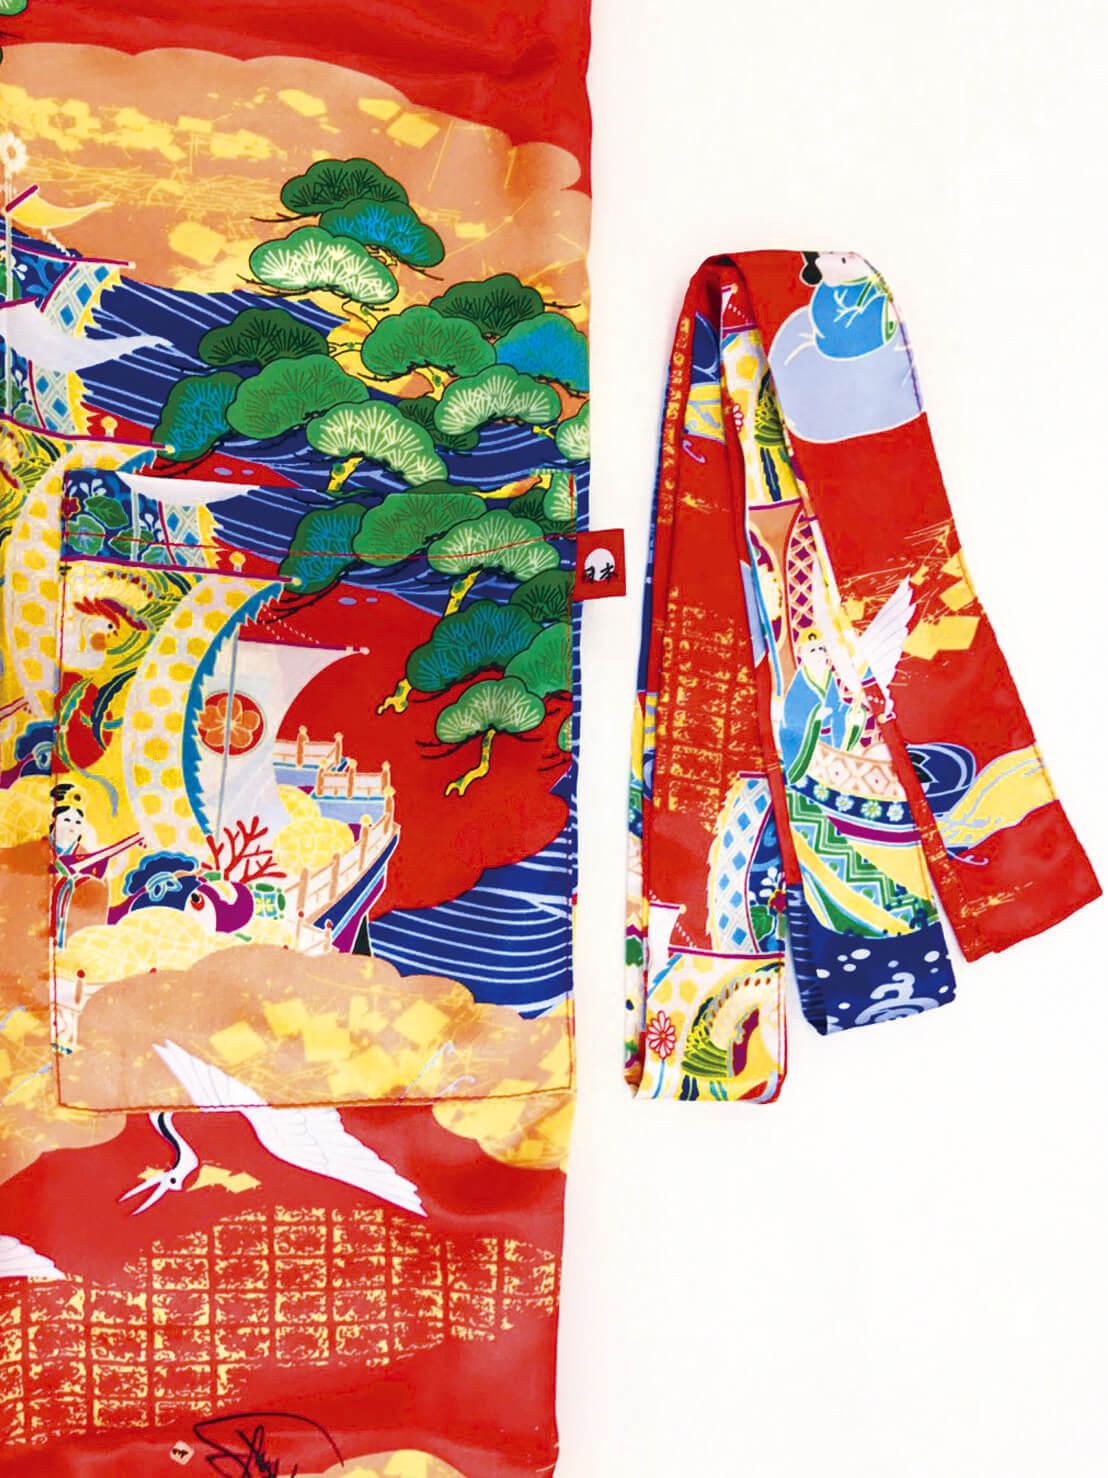 robe_takarabune-pocke